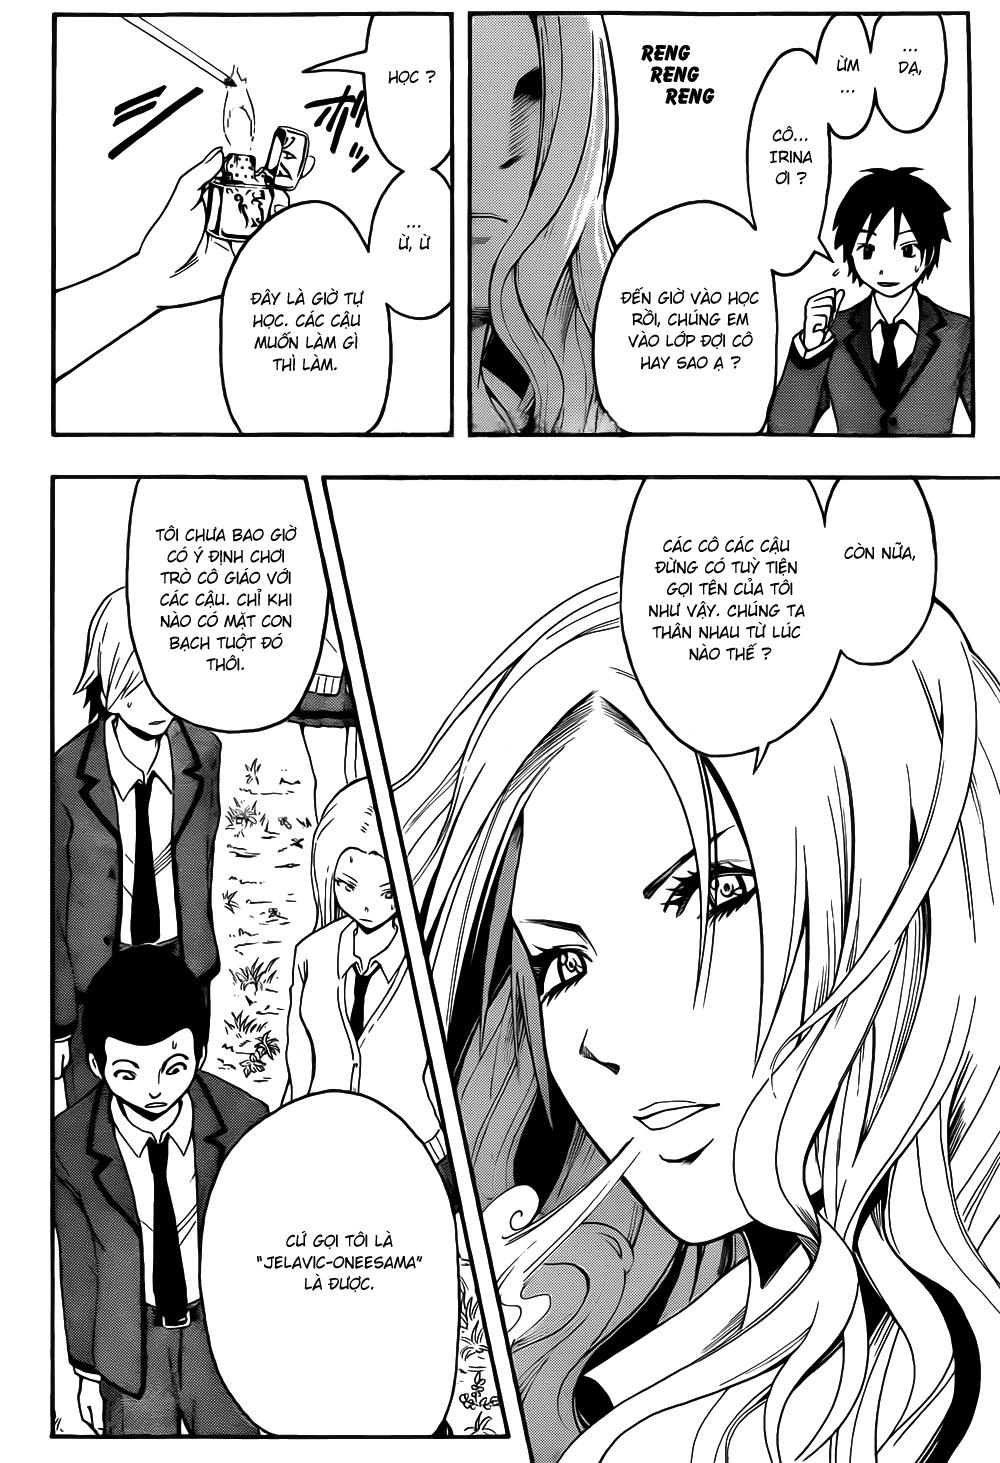 Ansatsu Kyoushitsu chap 8 trang 15